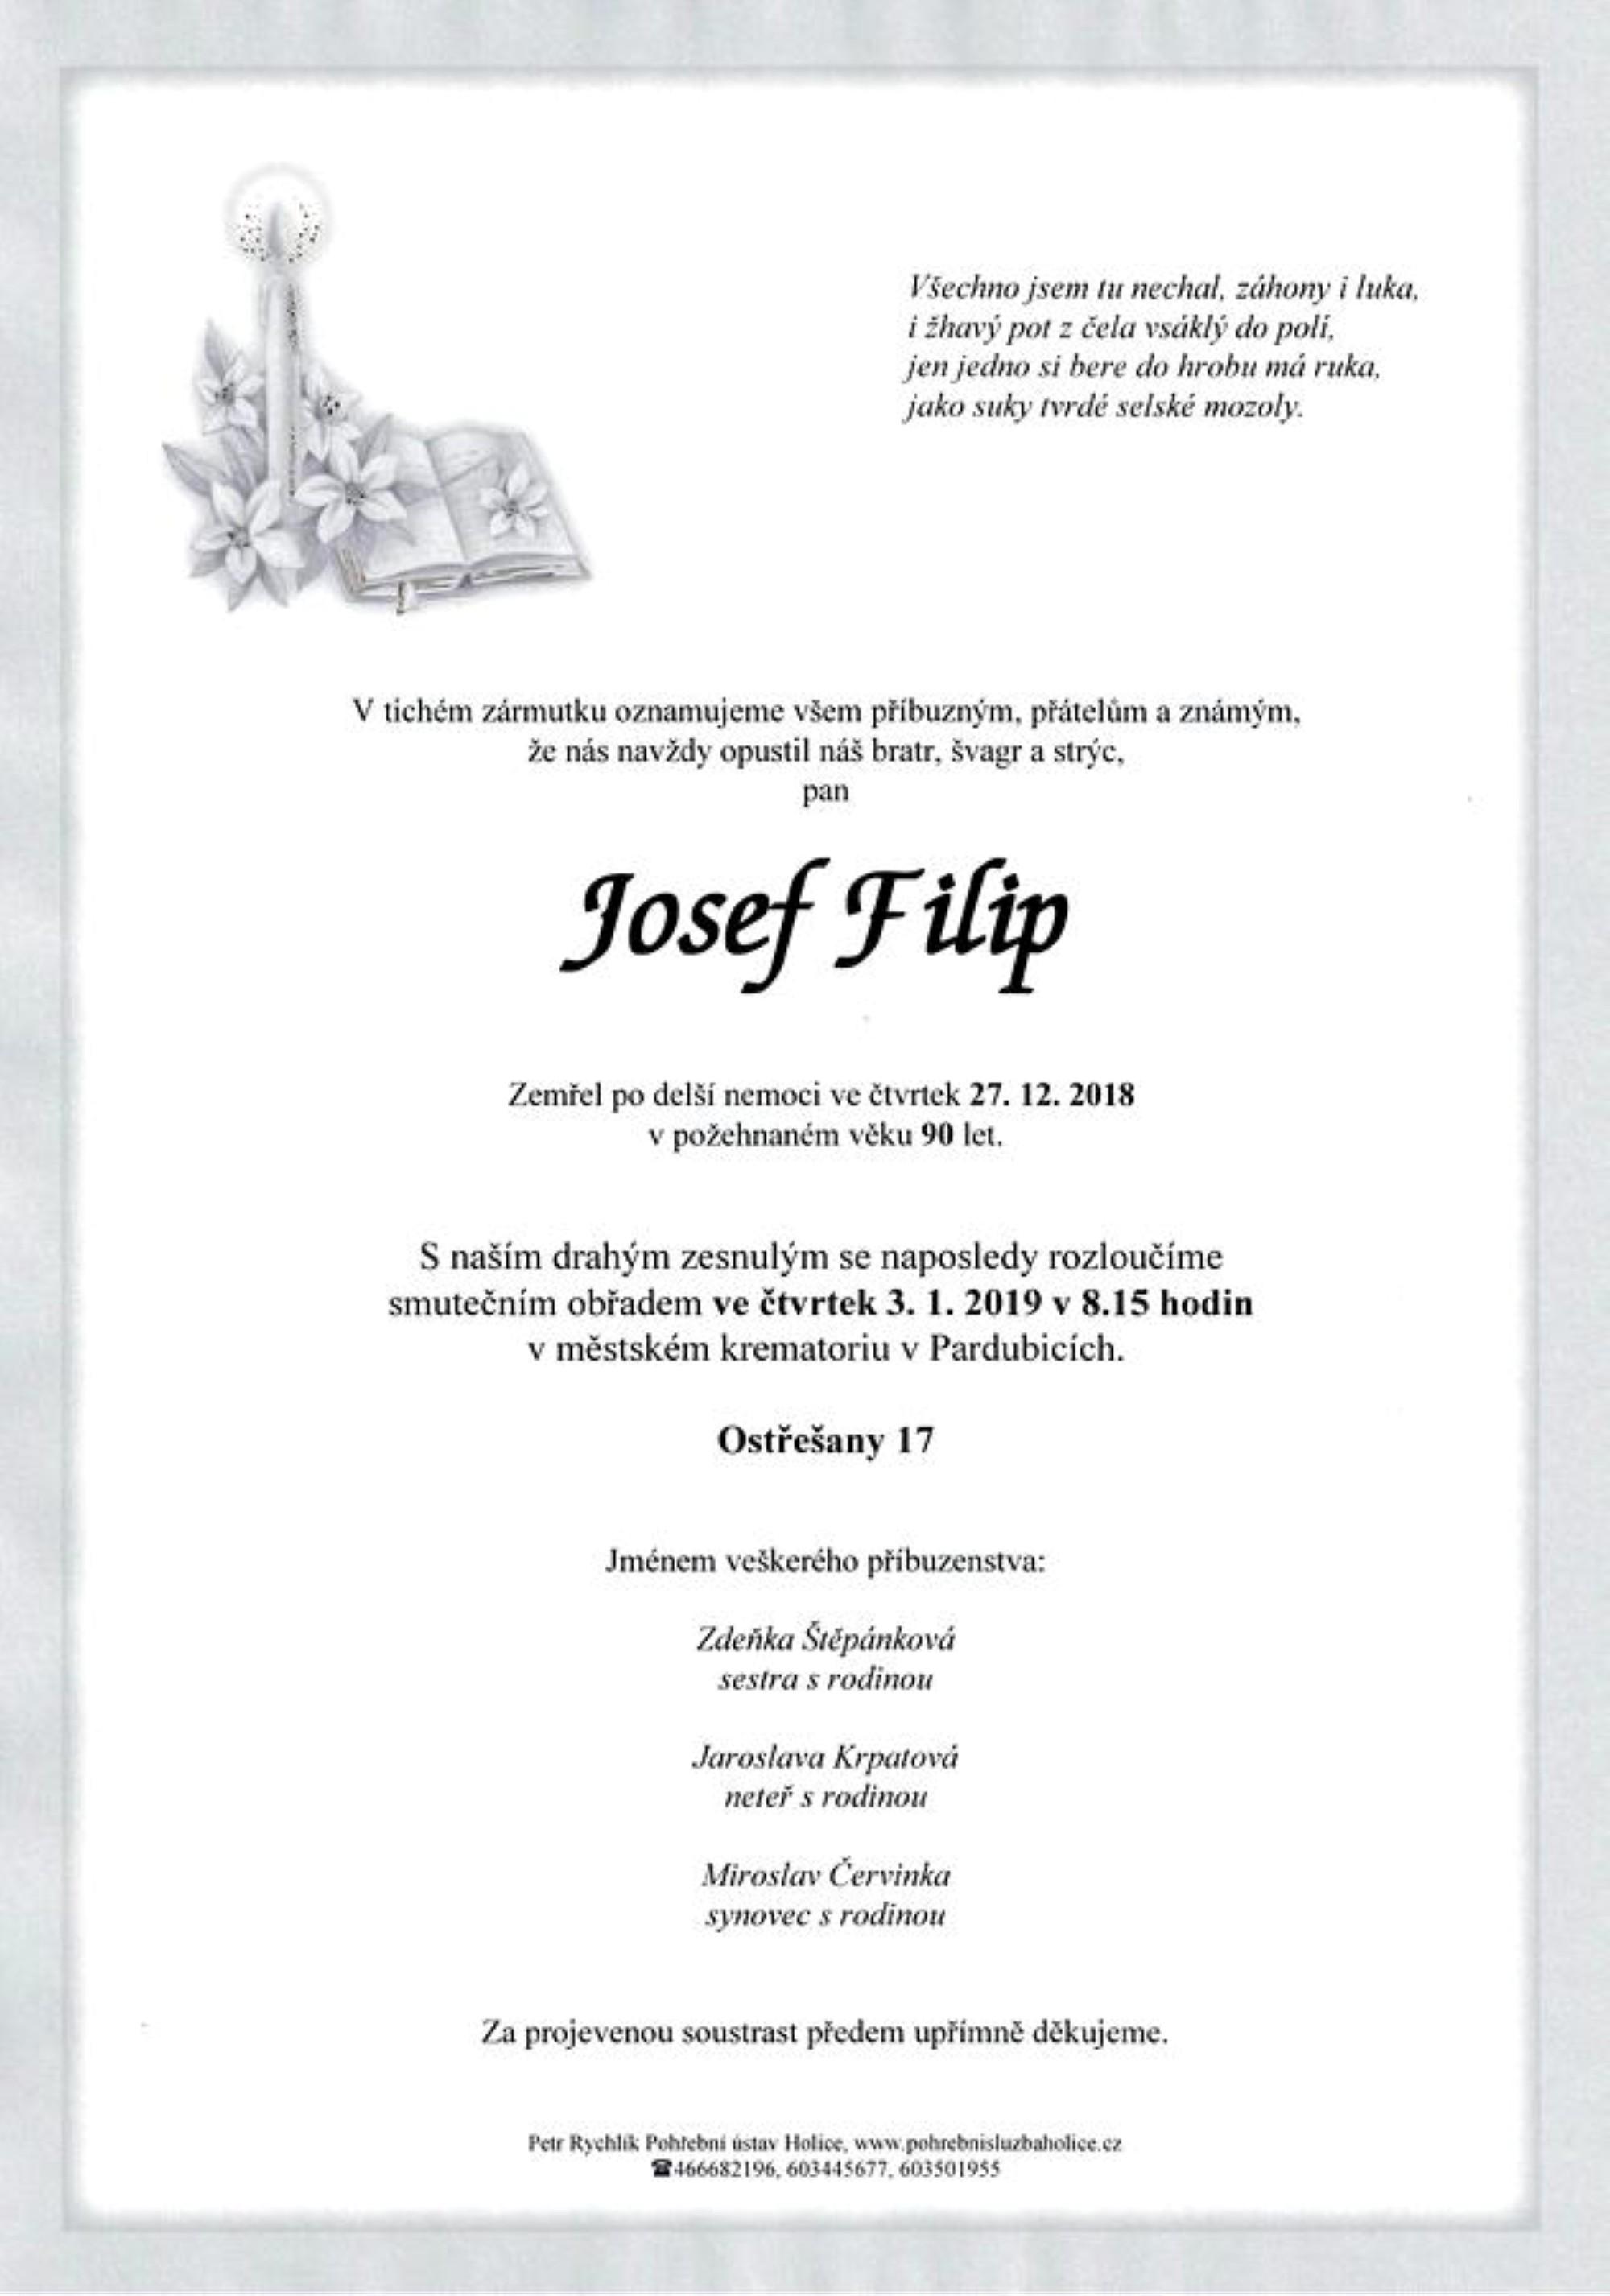 Josef Filip